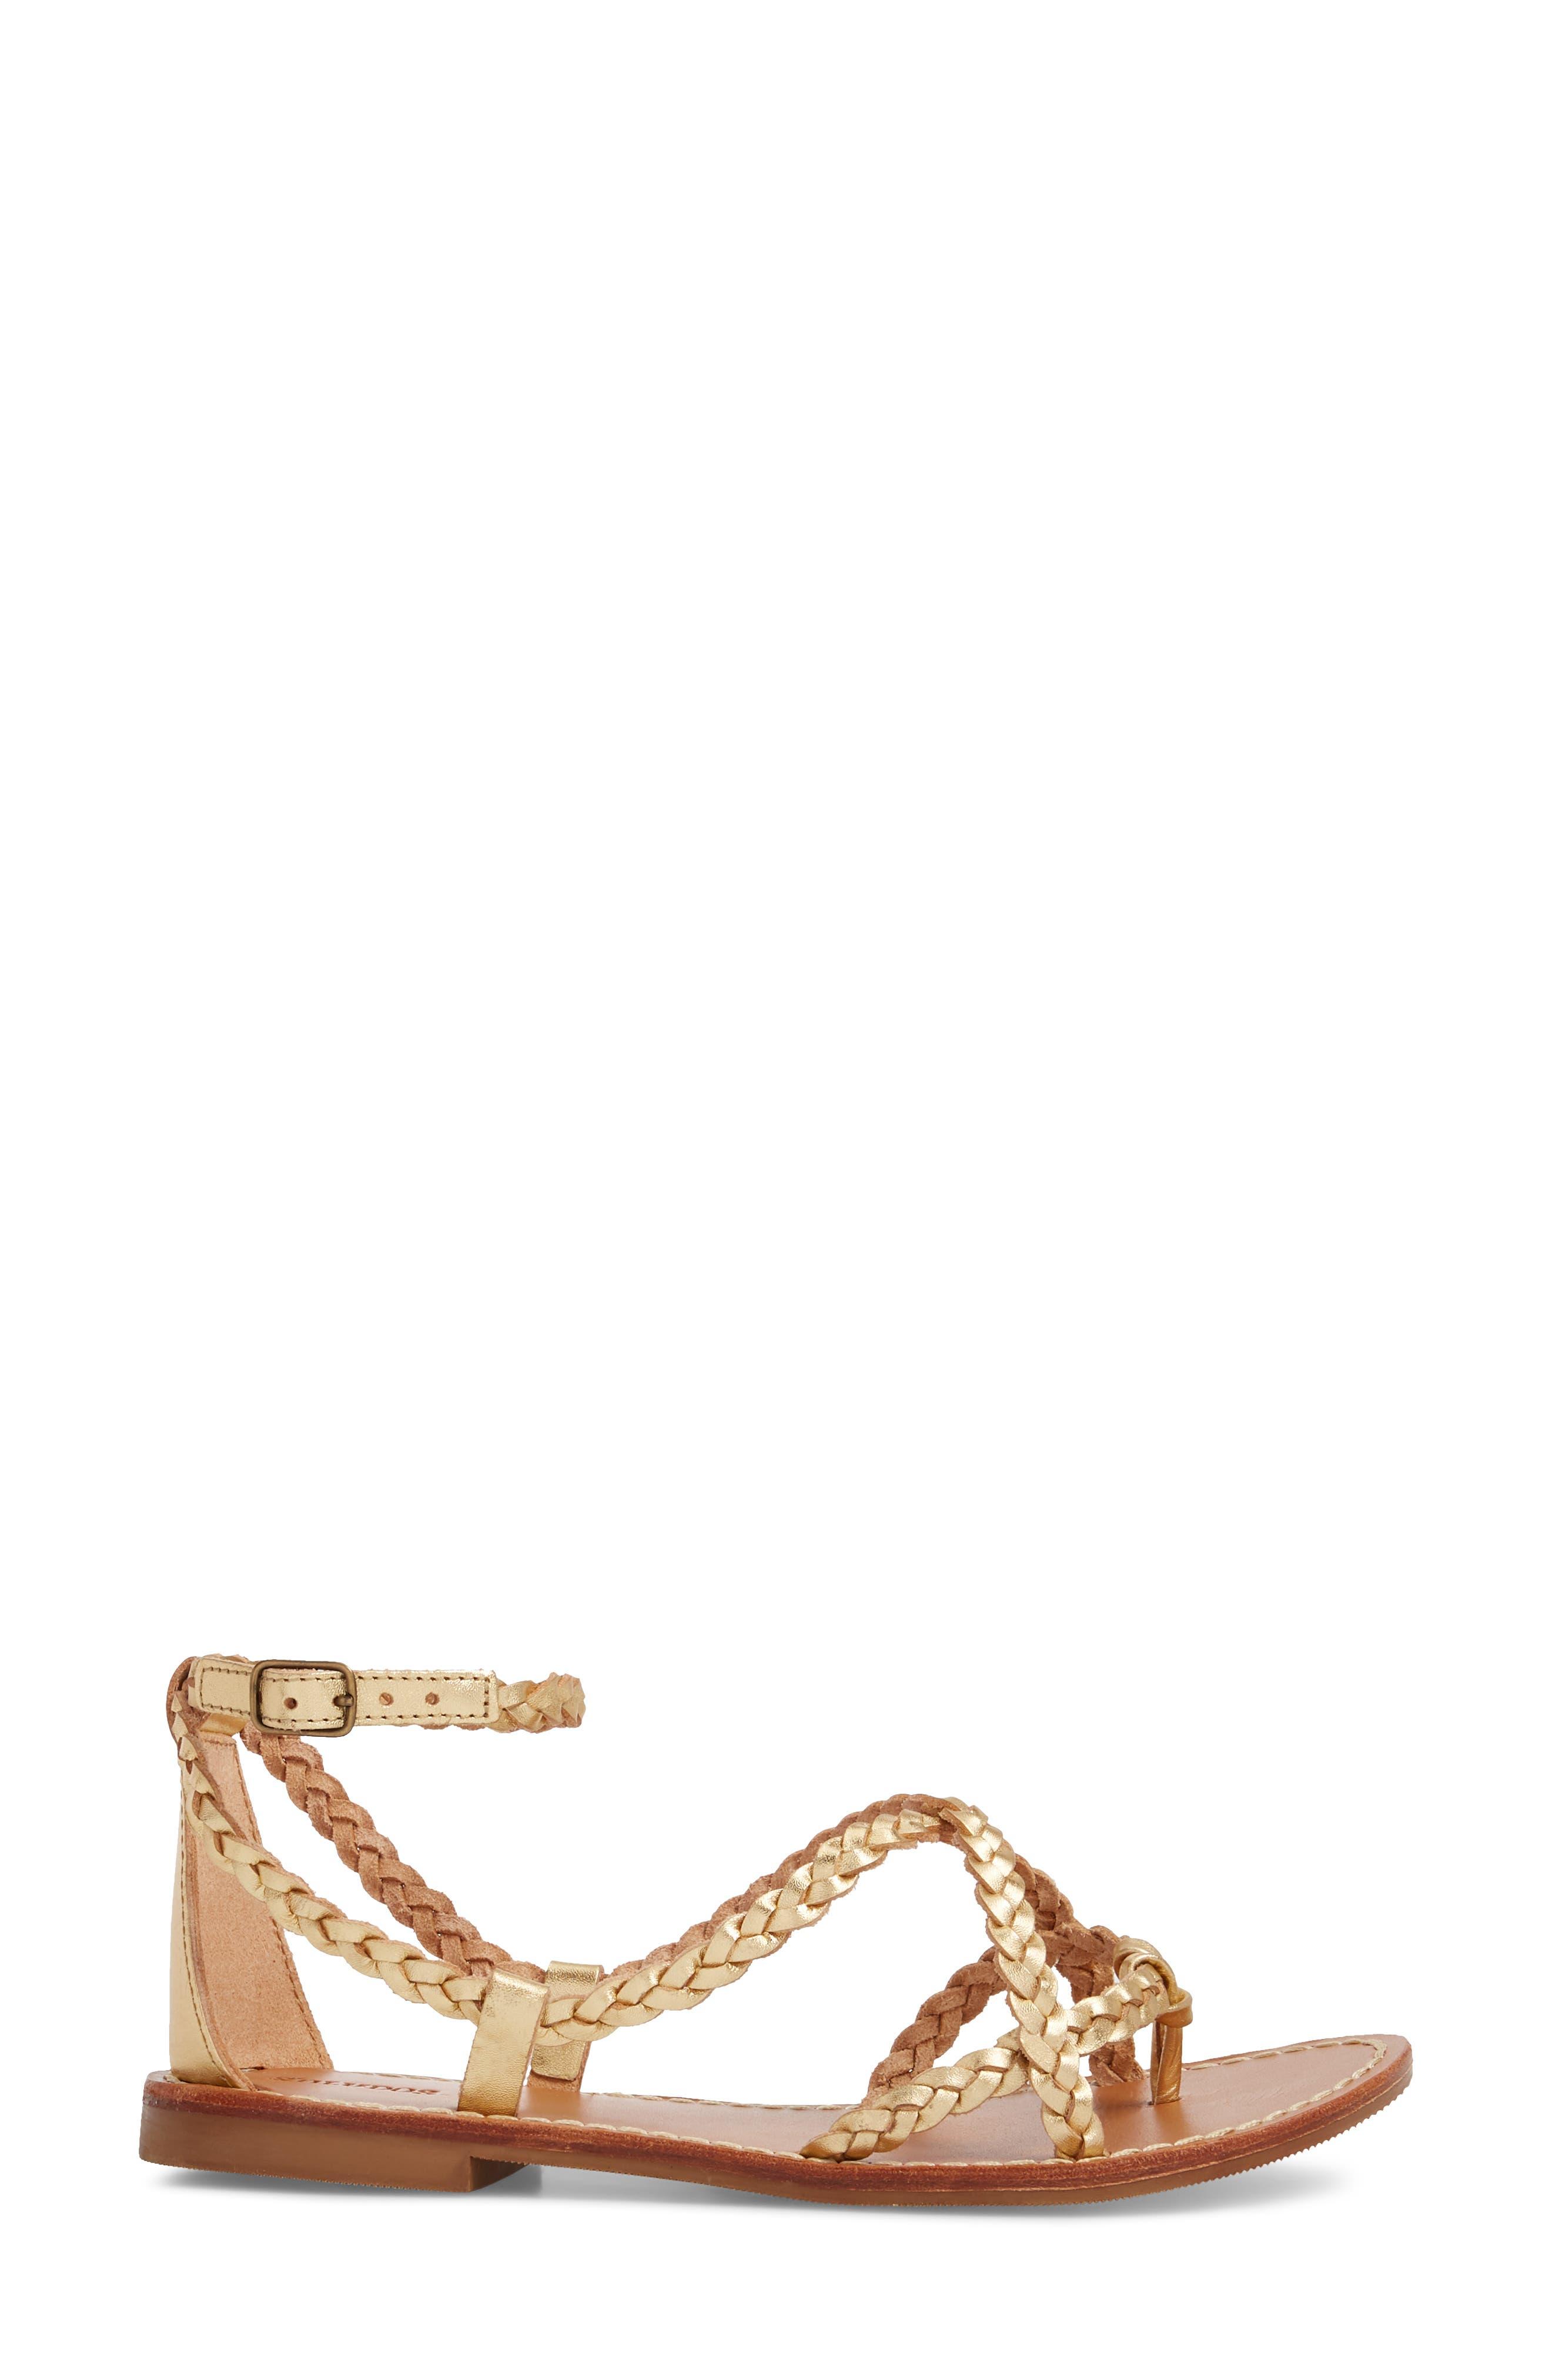 Amalfi Braided Metallic Sandal,                             Alternate thumbnail 3, color,                             Gold Leather